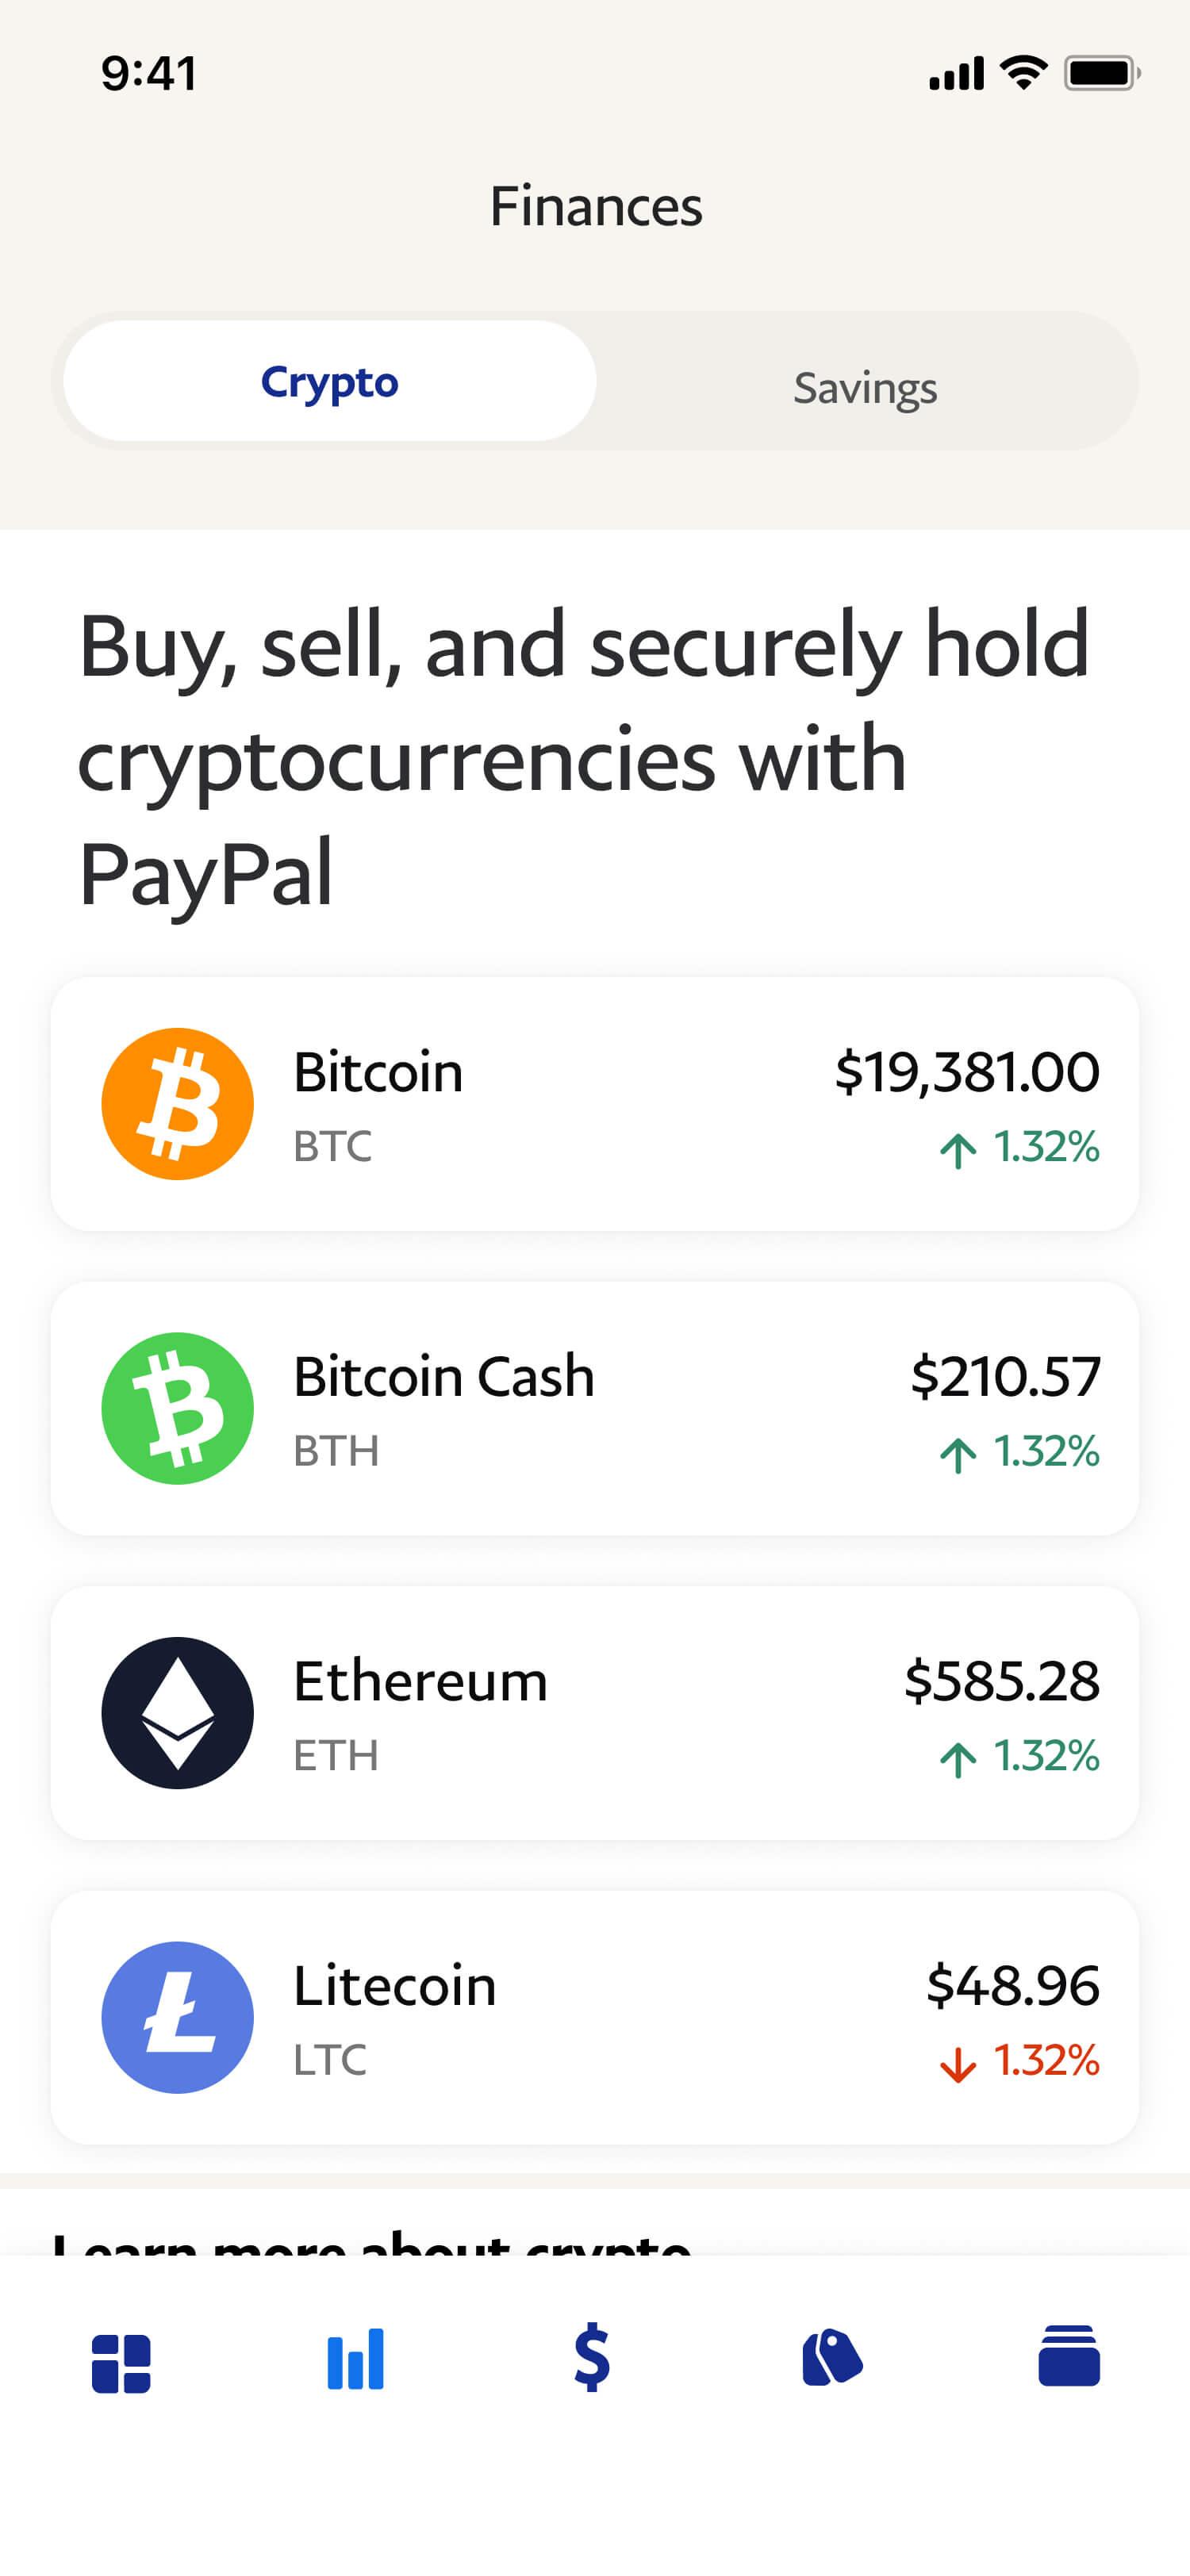 screenshot of crypto currency dashboard